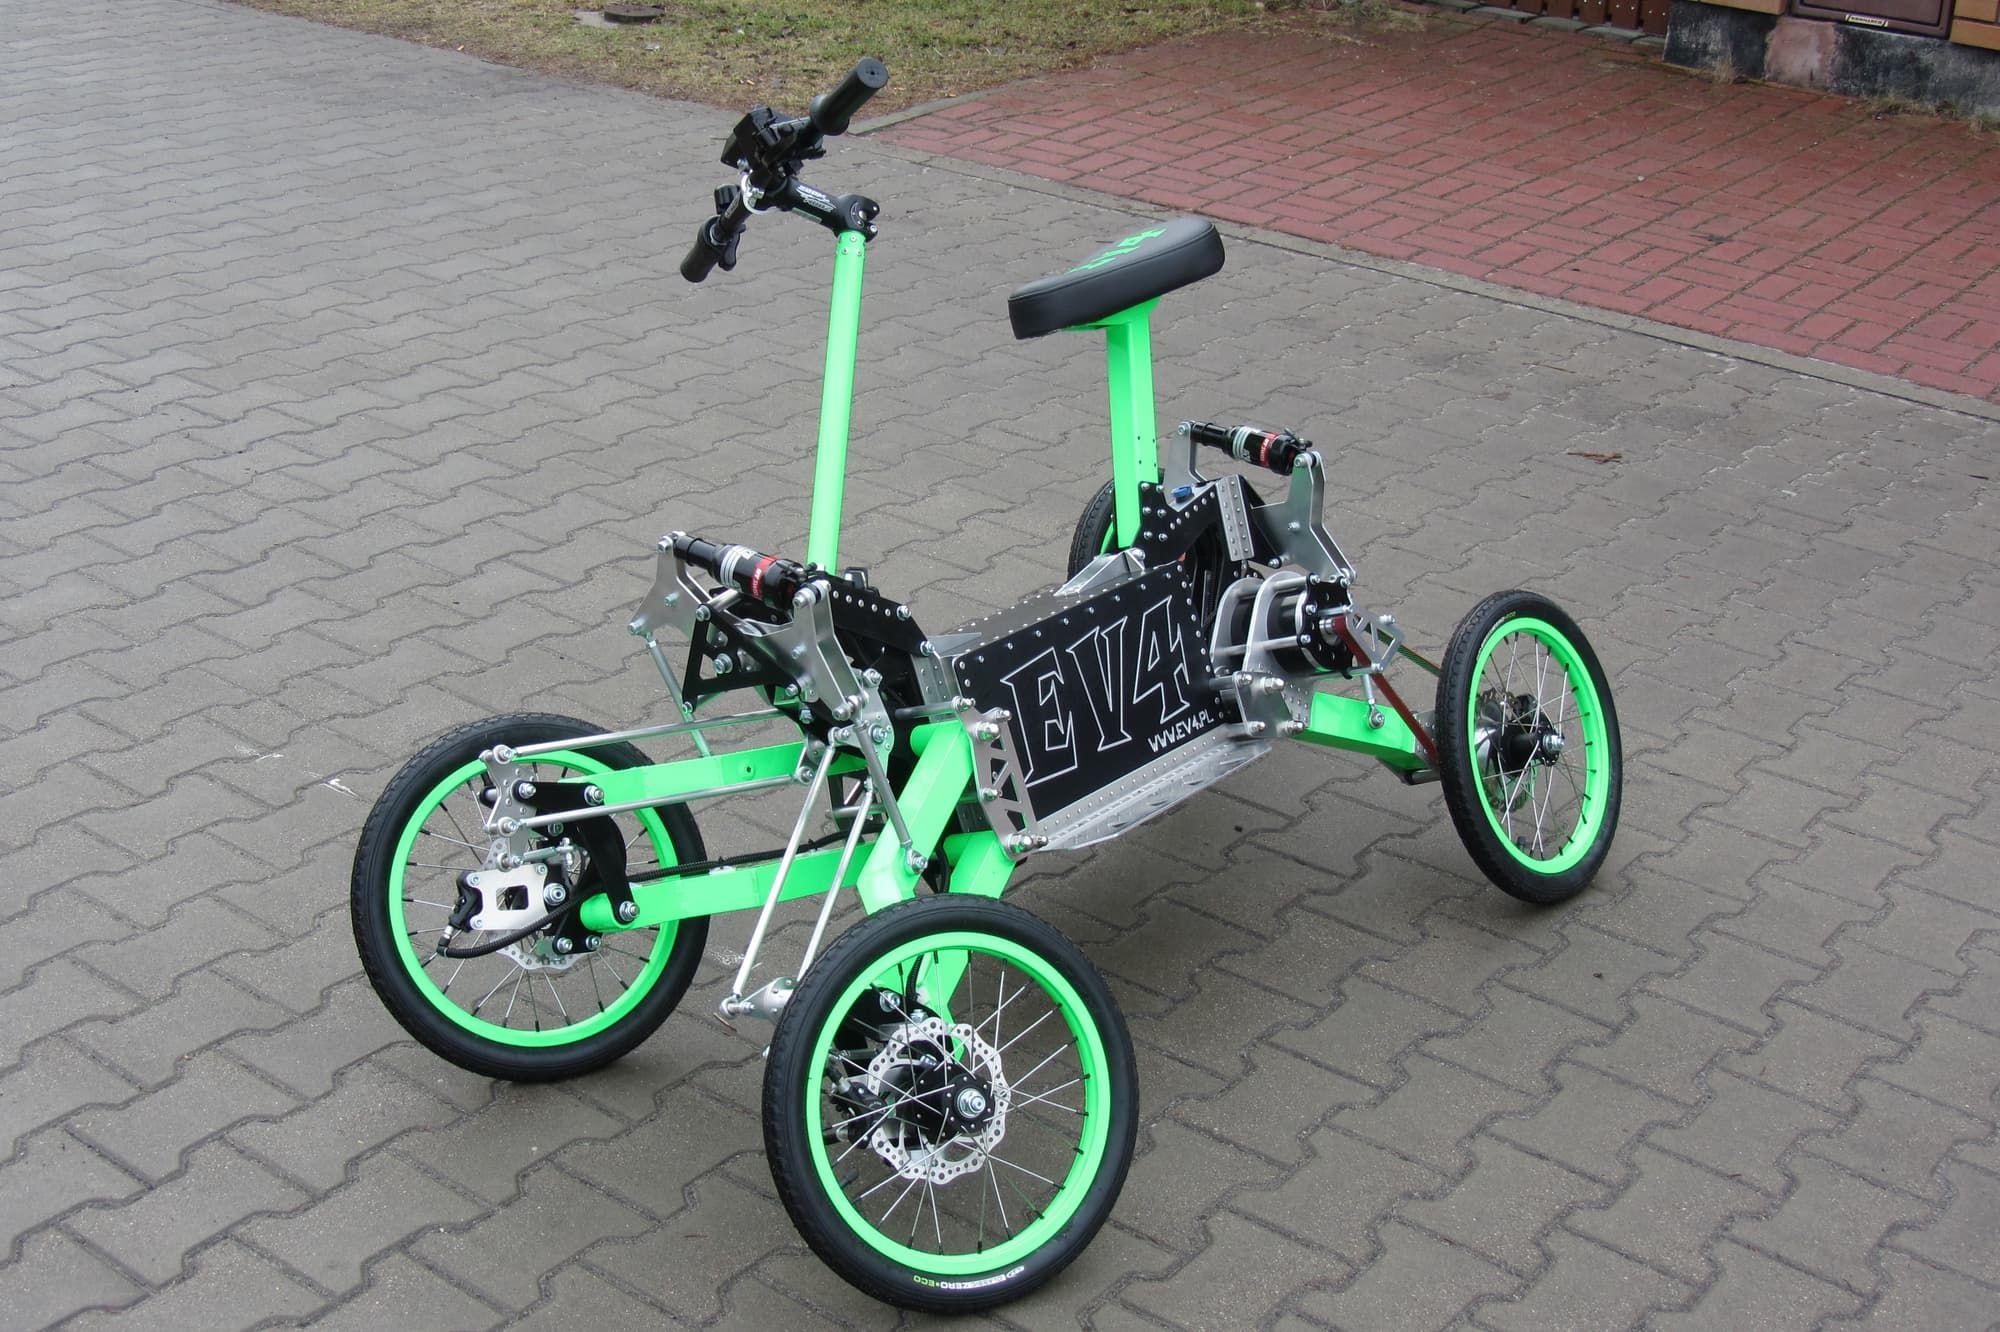 EV4 tilting electro vehicle from Poland ВеРосипеды